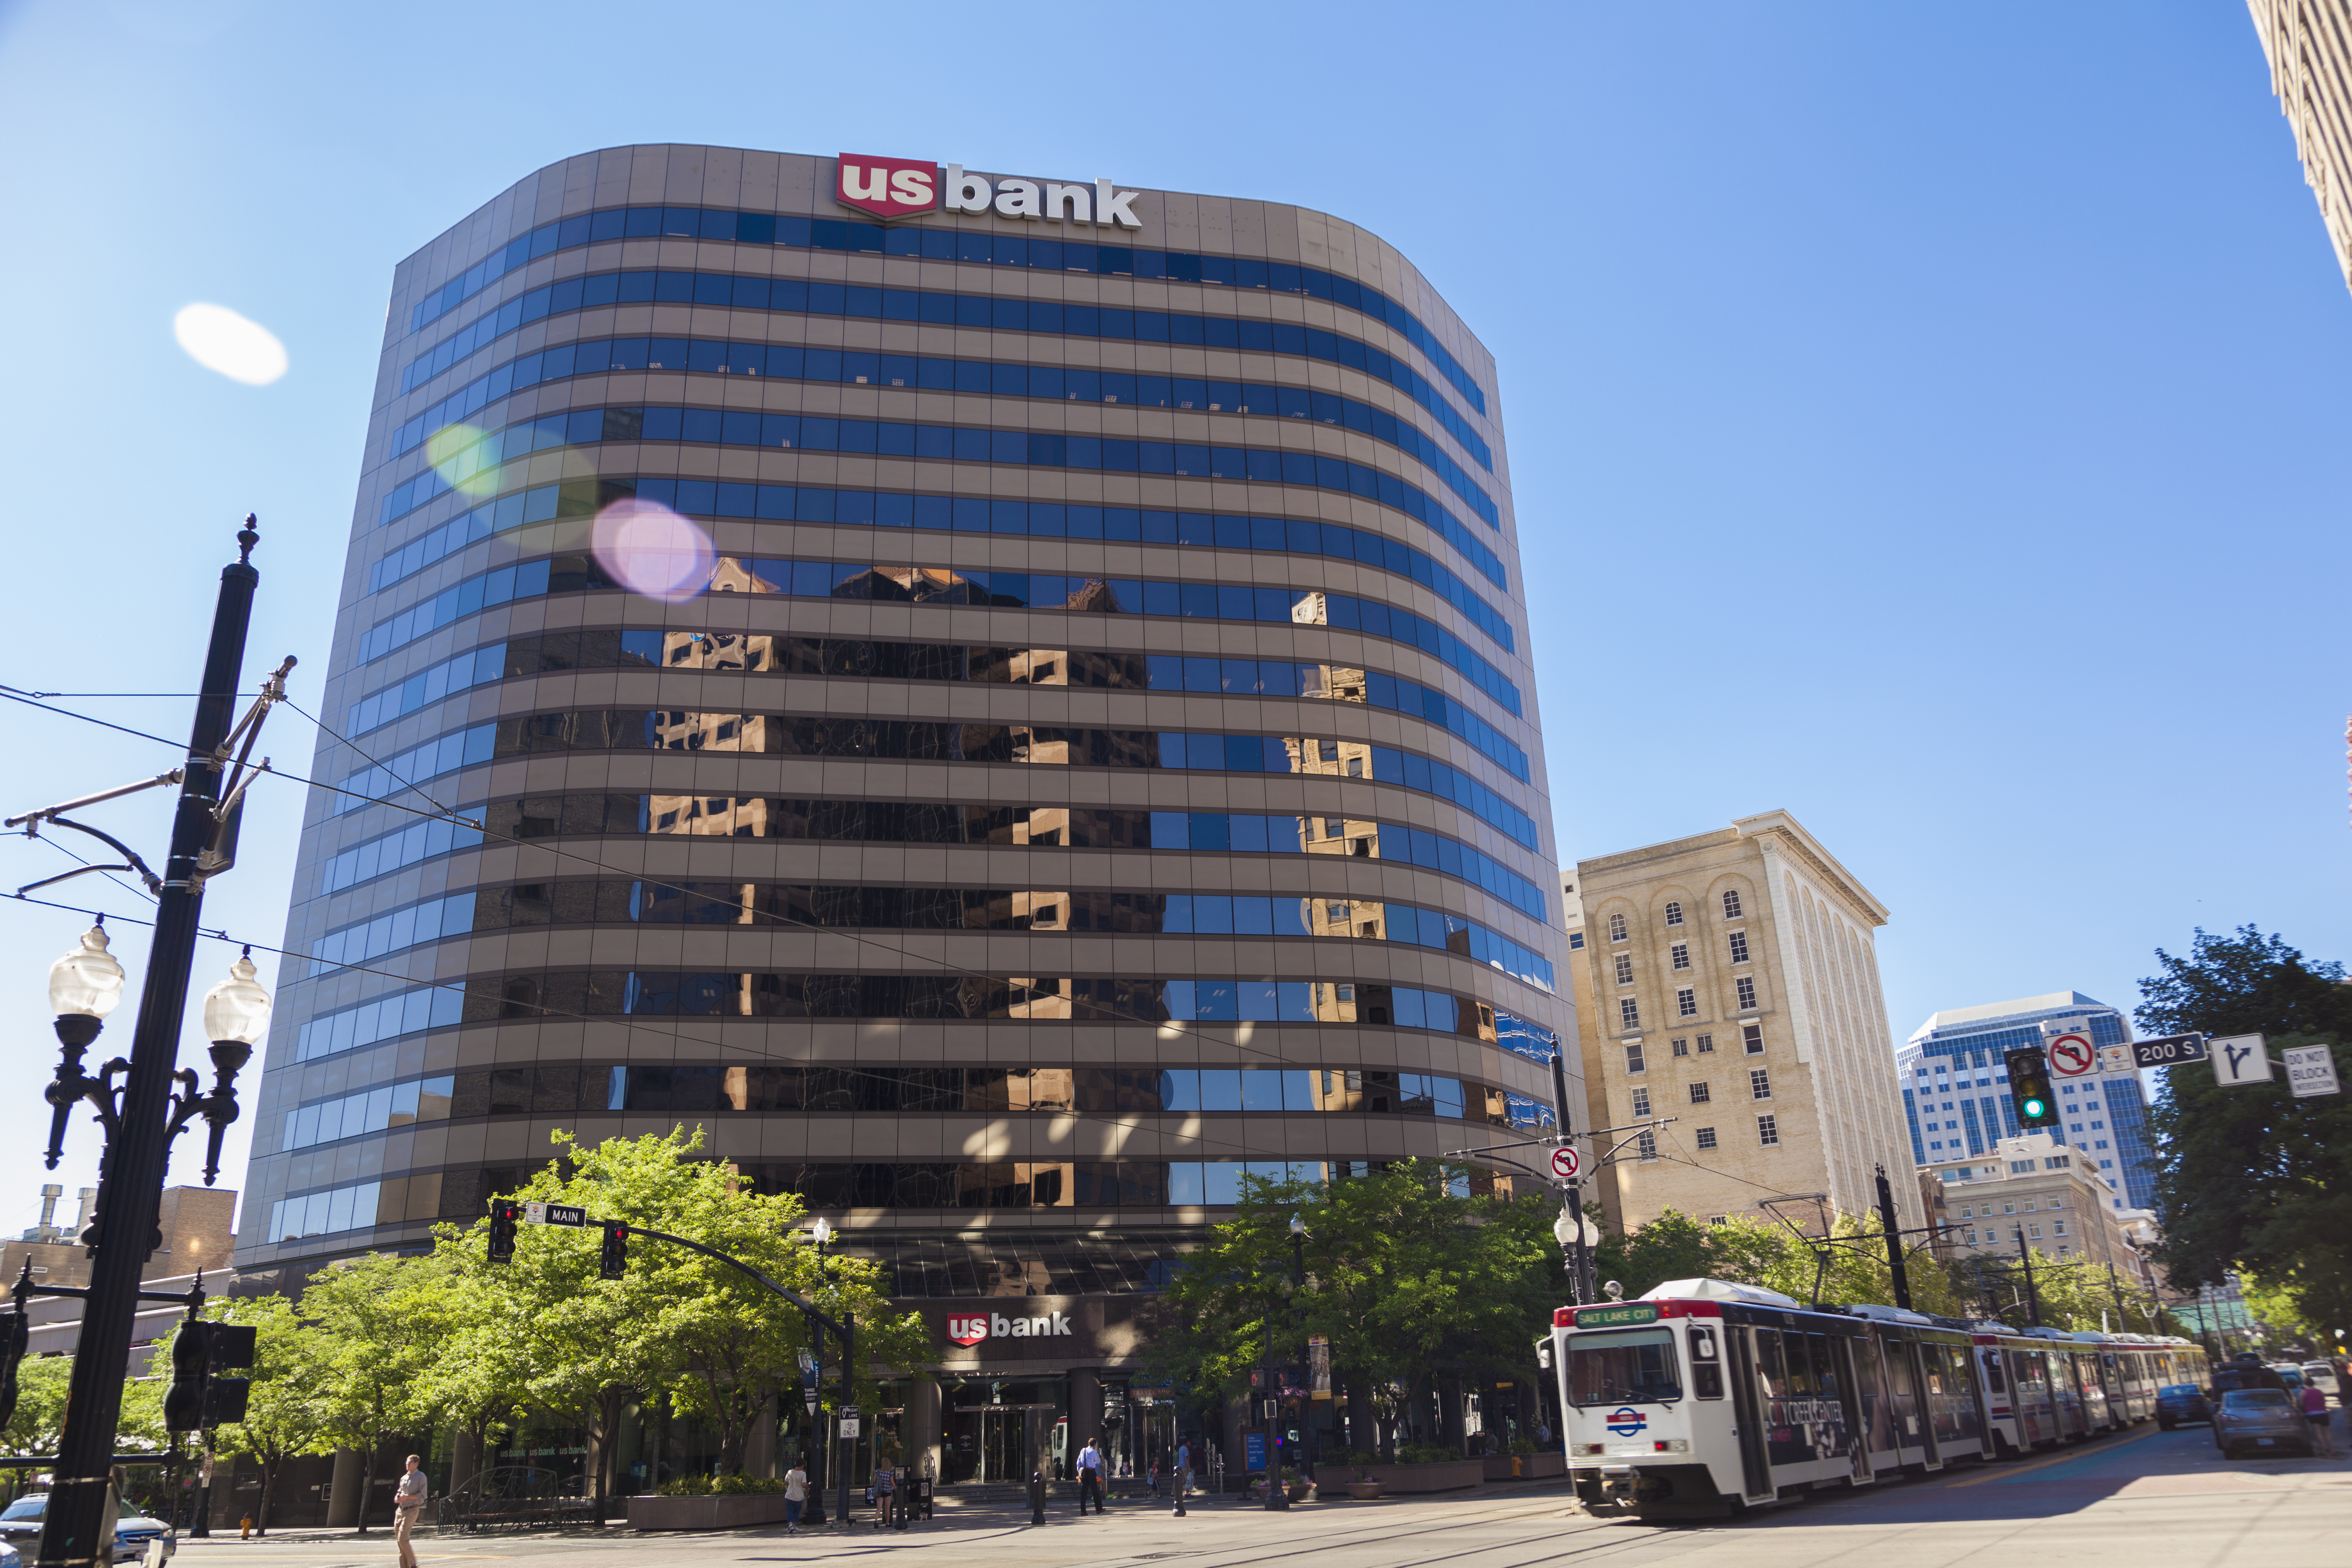 Bank Of America Downtown Salt Lake City